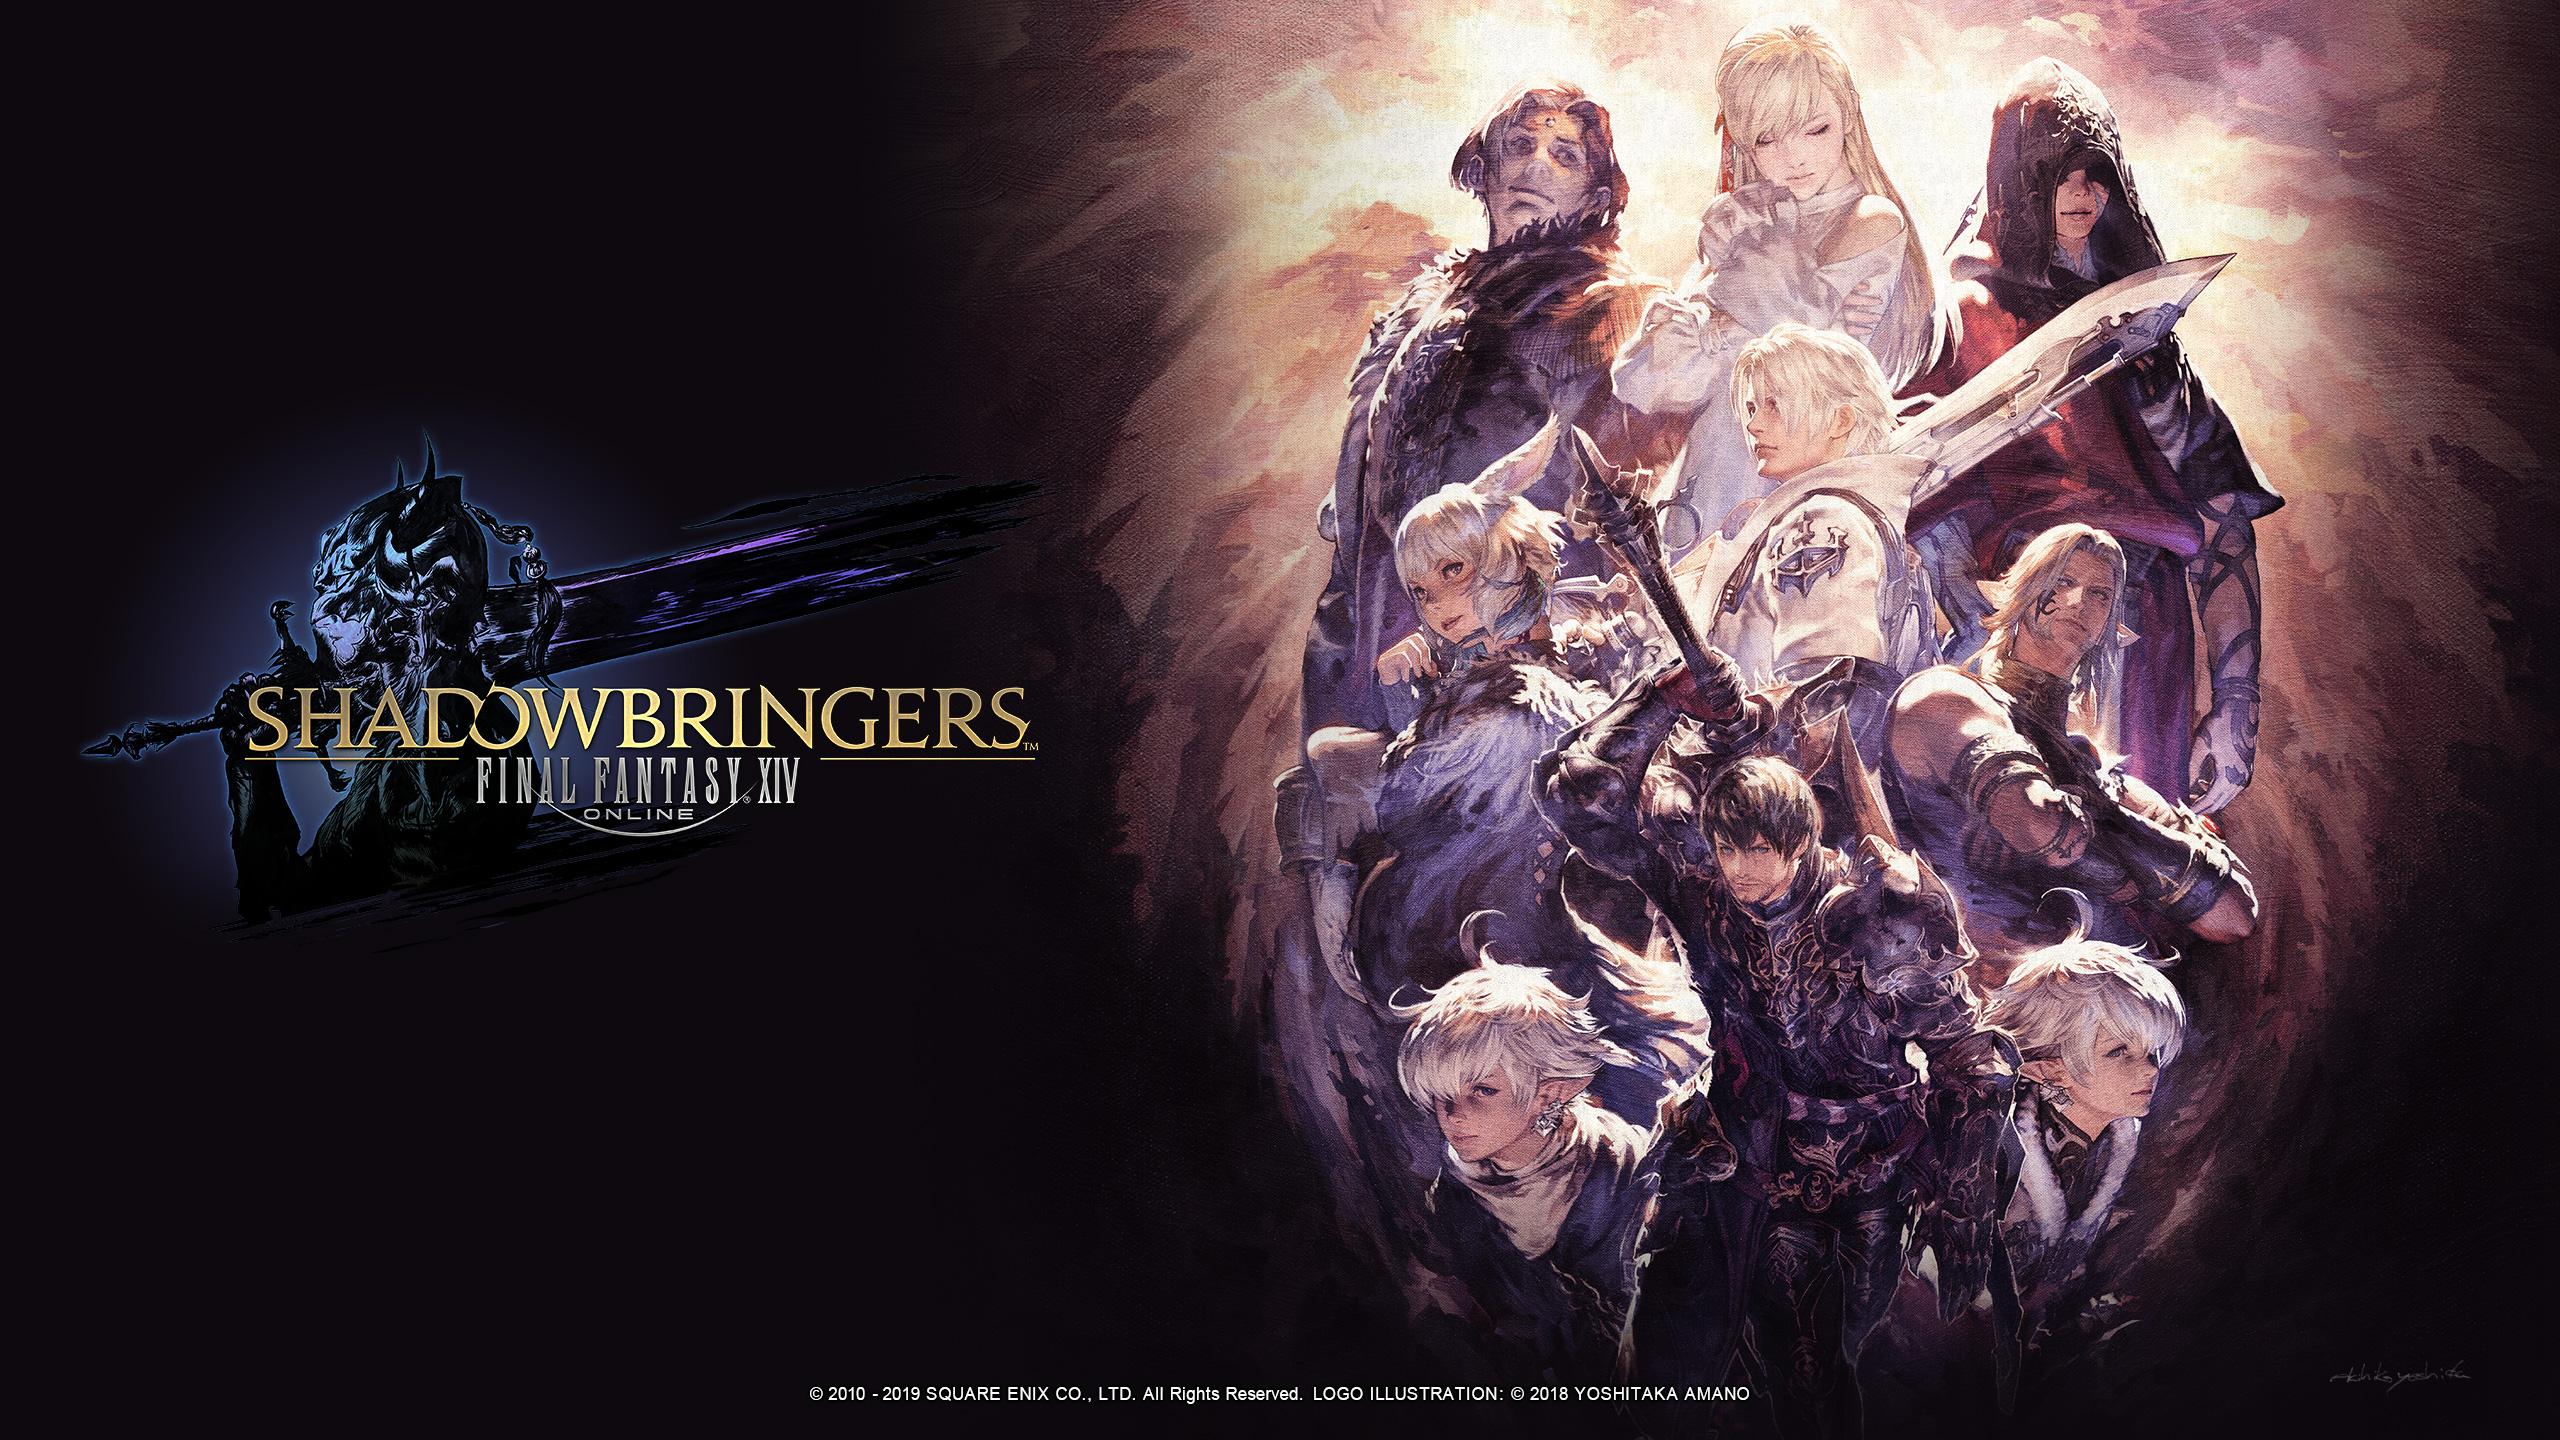 General 2560x1440 Final Fantasy Final Fantasy XIV sword fantasy art video game art